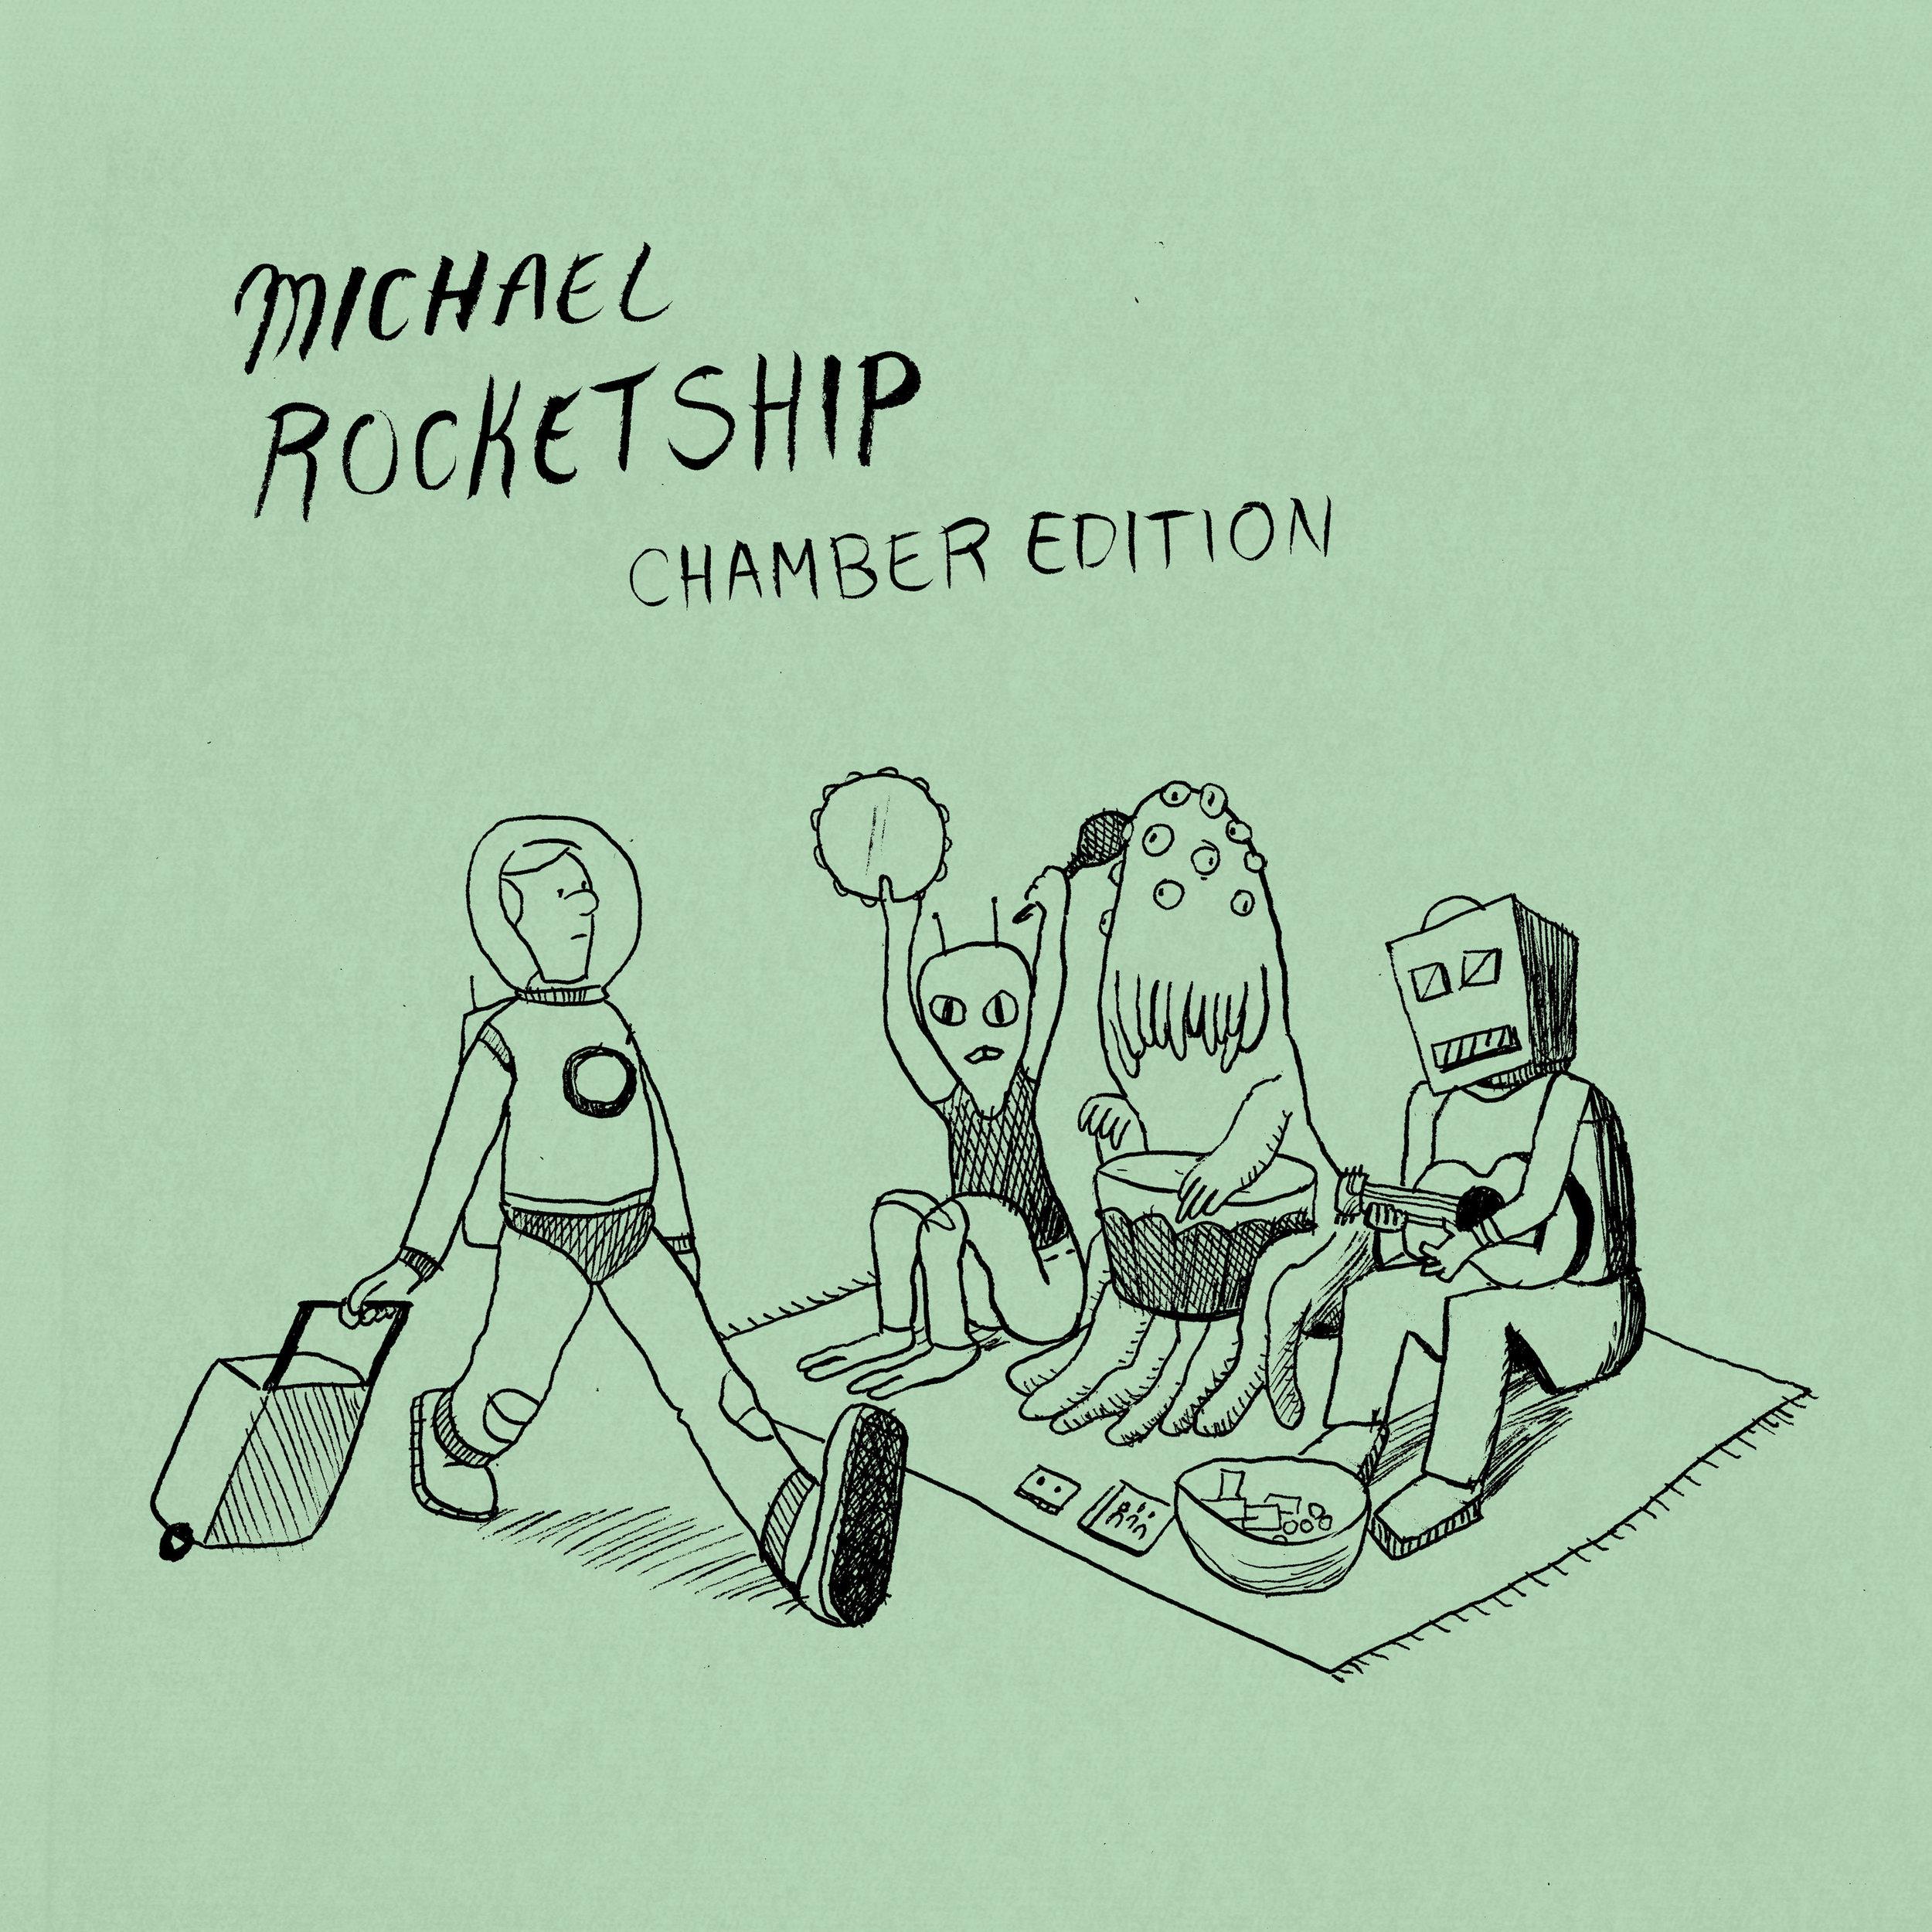 rocketship-chamber2_mockup.jpg